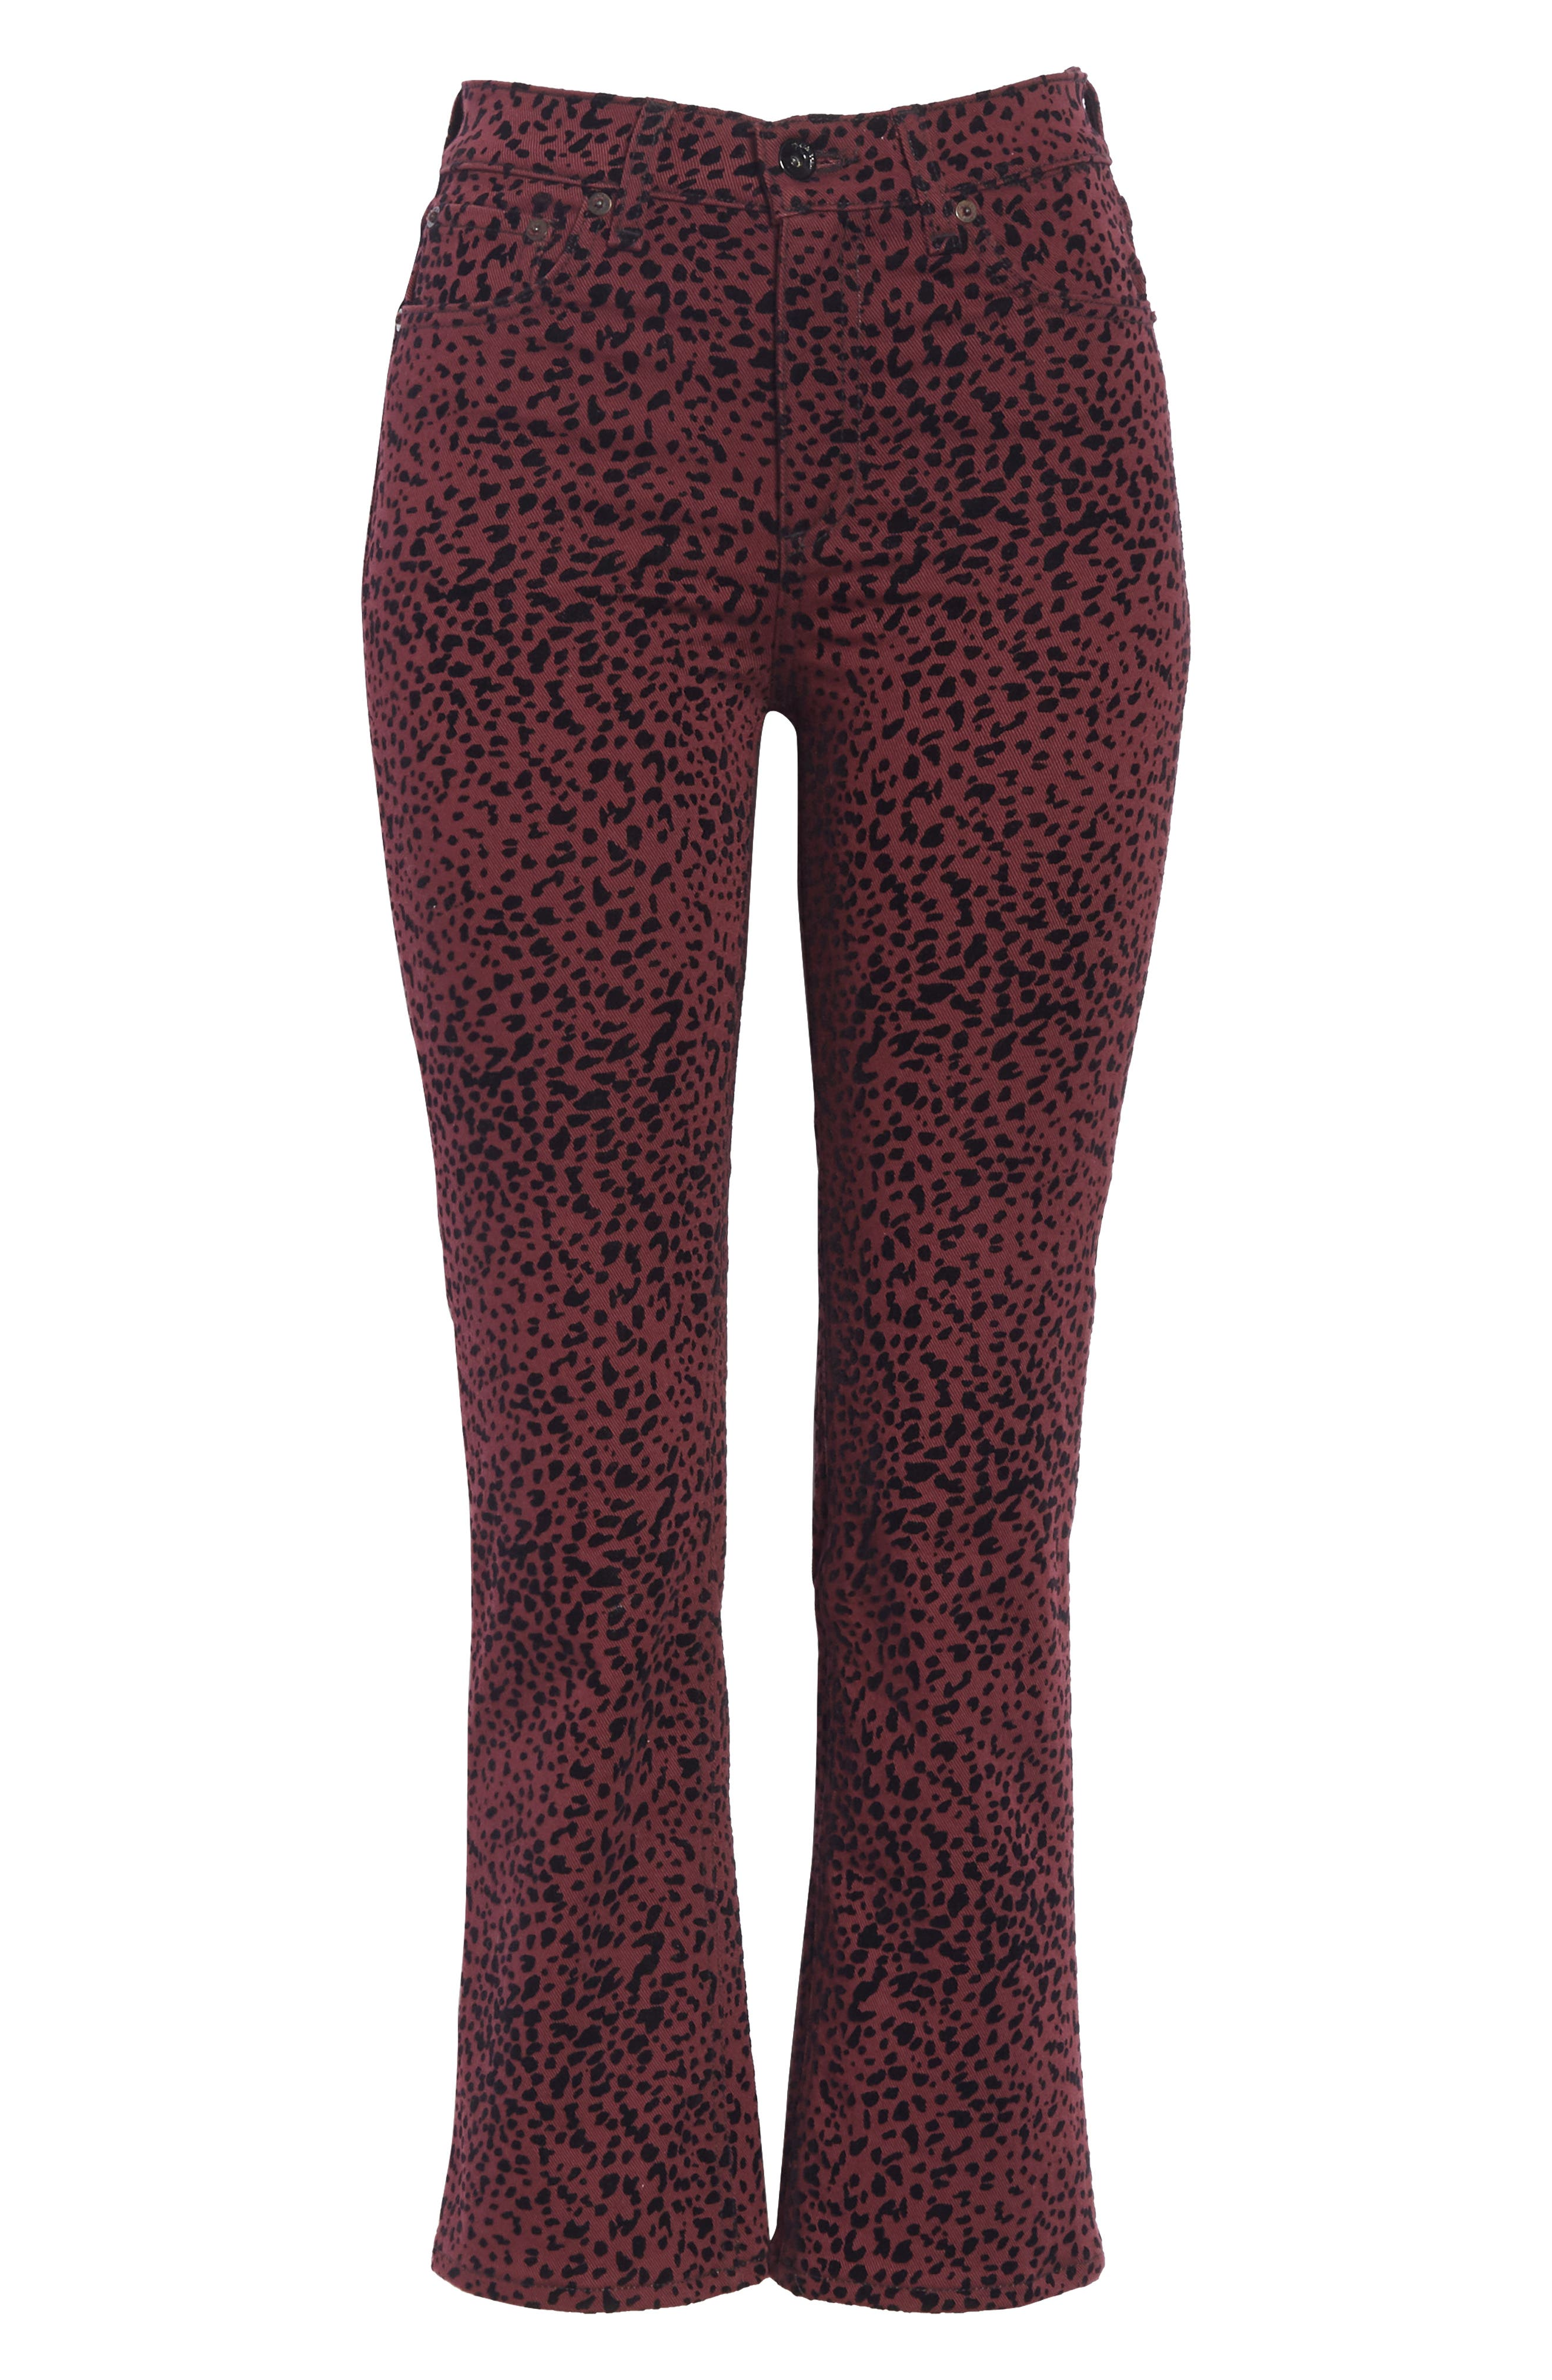 Hana High Waist Crop Flare Jeans,                             Alternate thumbnail 6, color,                             930